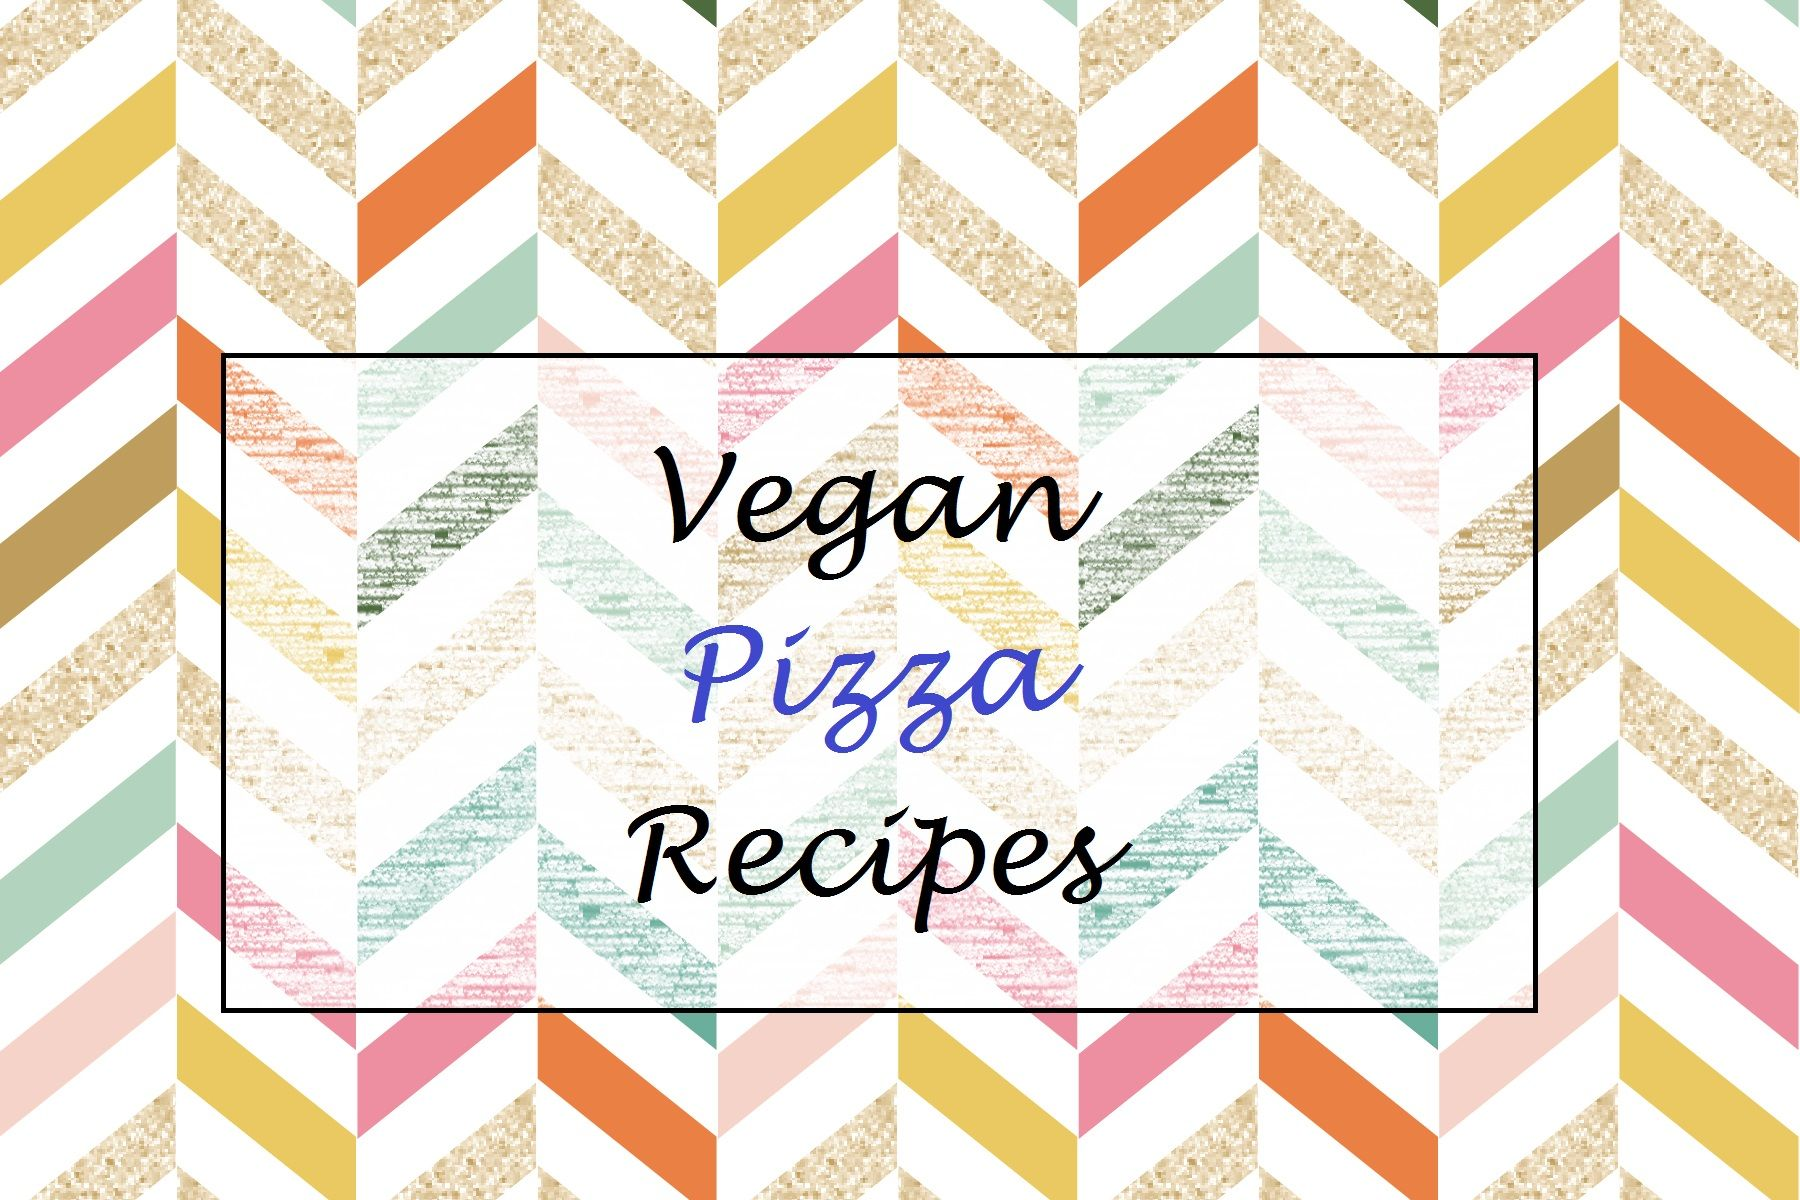 Vegan Pizza Recipes Header